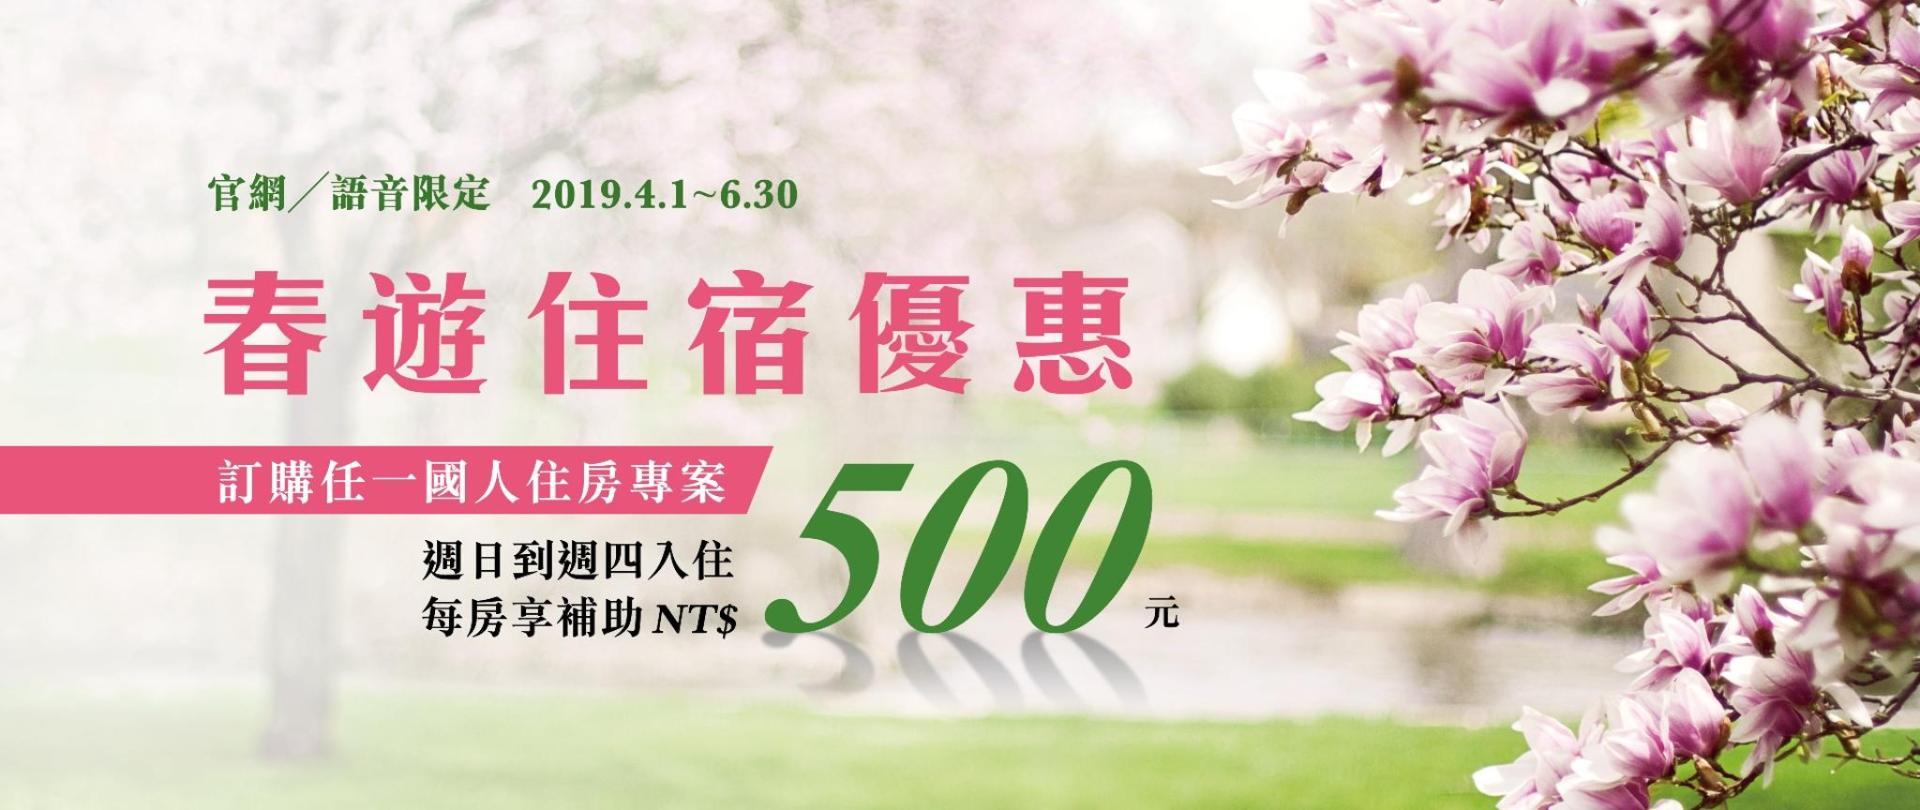 Slide Show1920X810_2019春遊補助活動公告.jpg